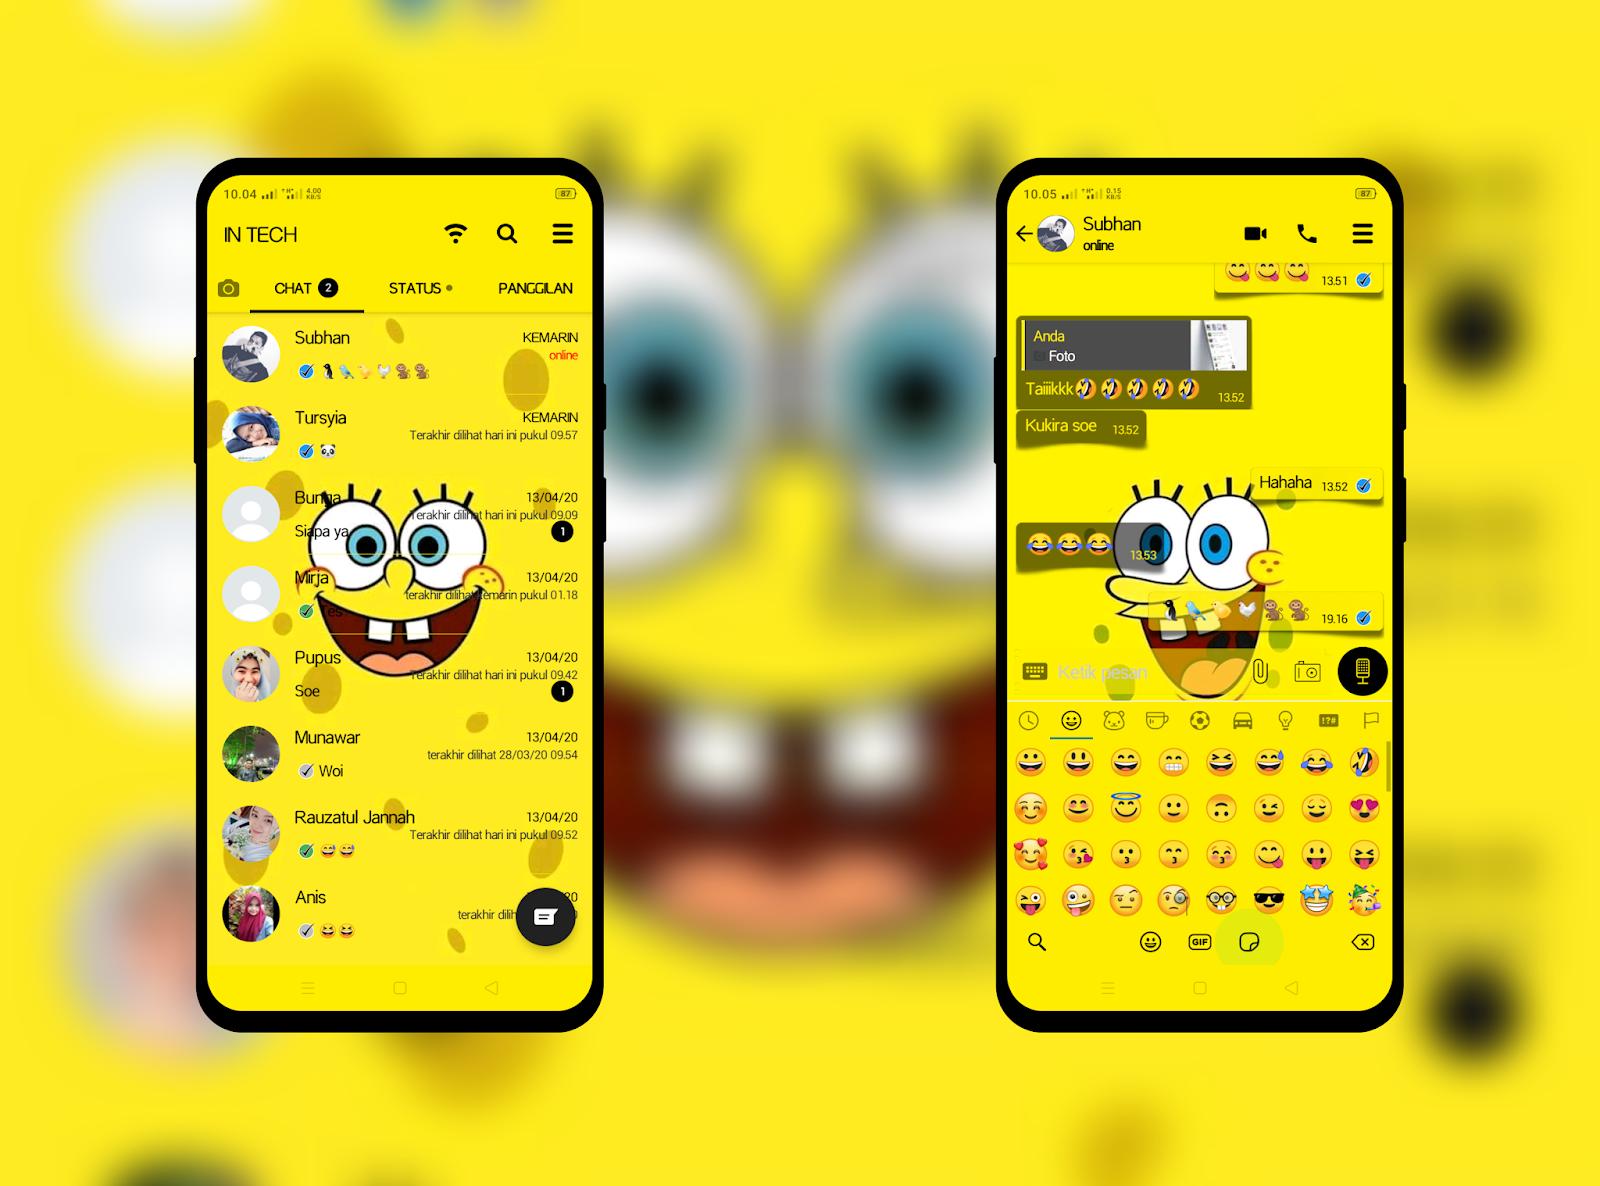 Kumpulan Tema WhatsApp Spongebob Tampilan Baru 2020 - Next ...